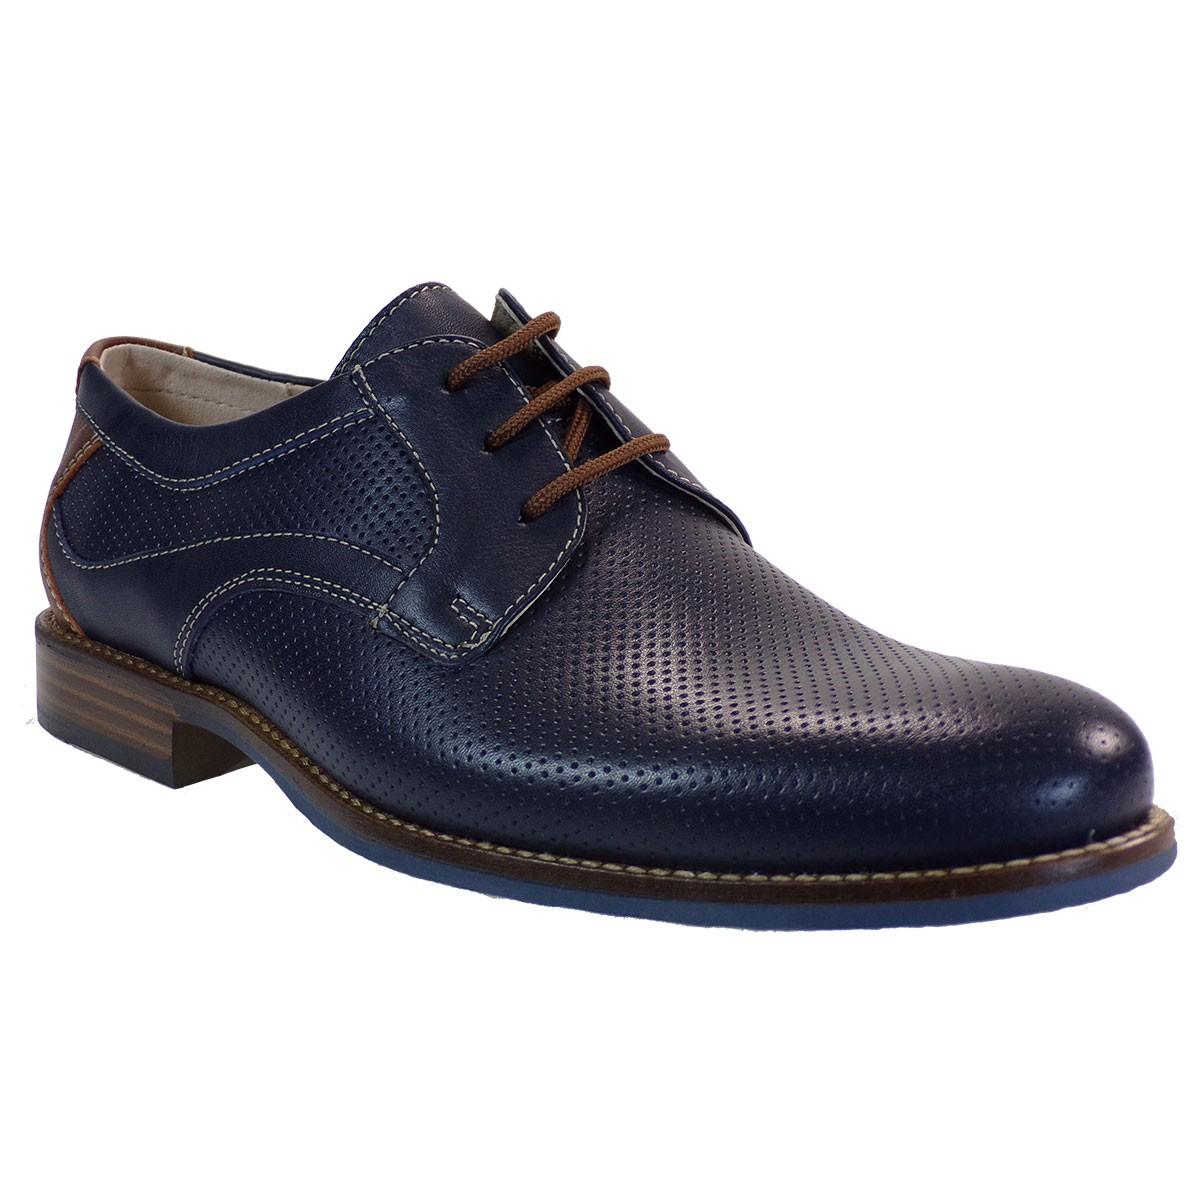 Softies Ανδρικά Παπούτσια 6998 Μπλέ Δέρμα